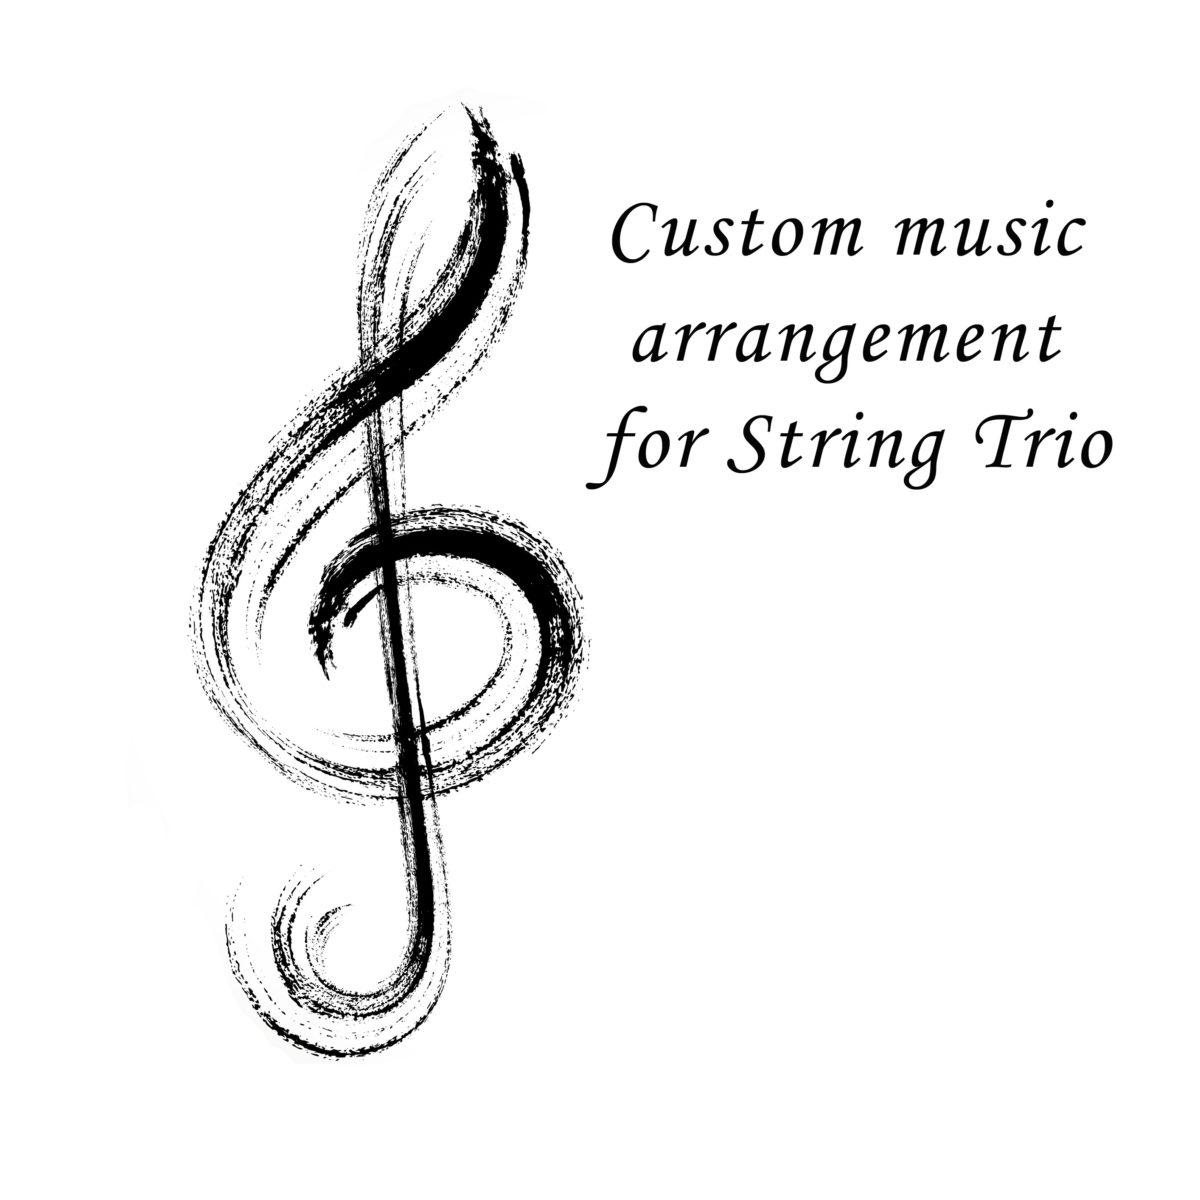 Custom arrangement for String Trio